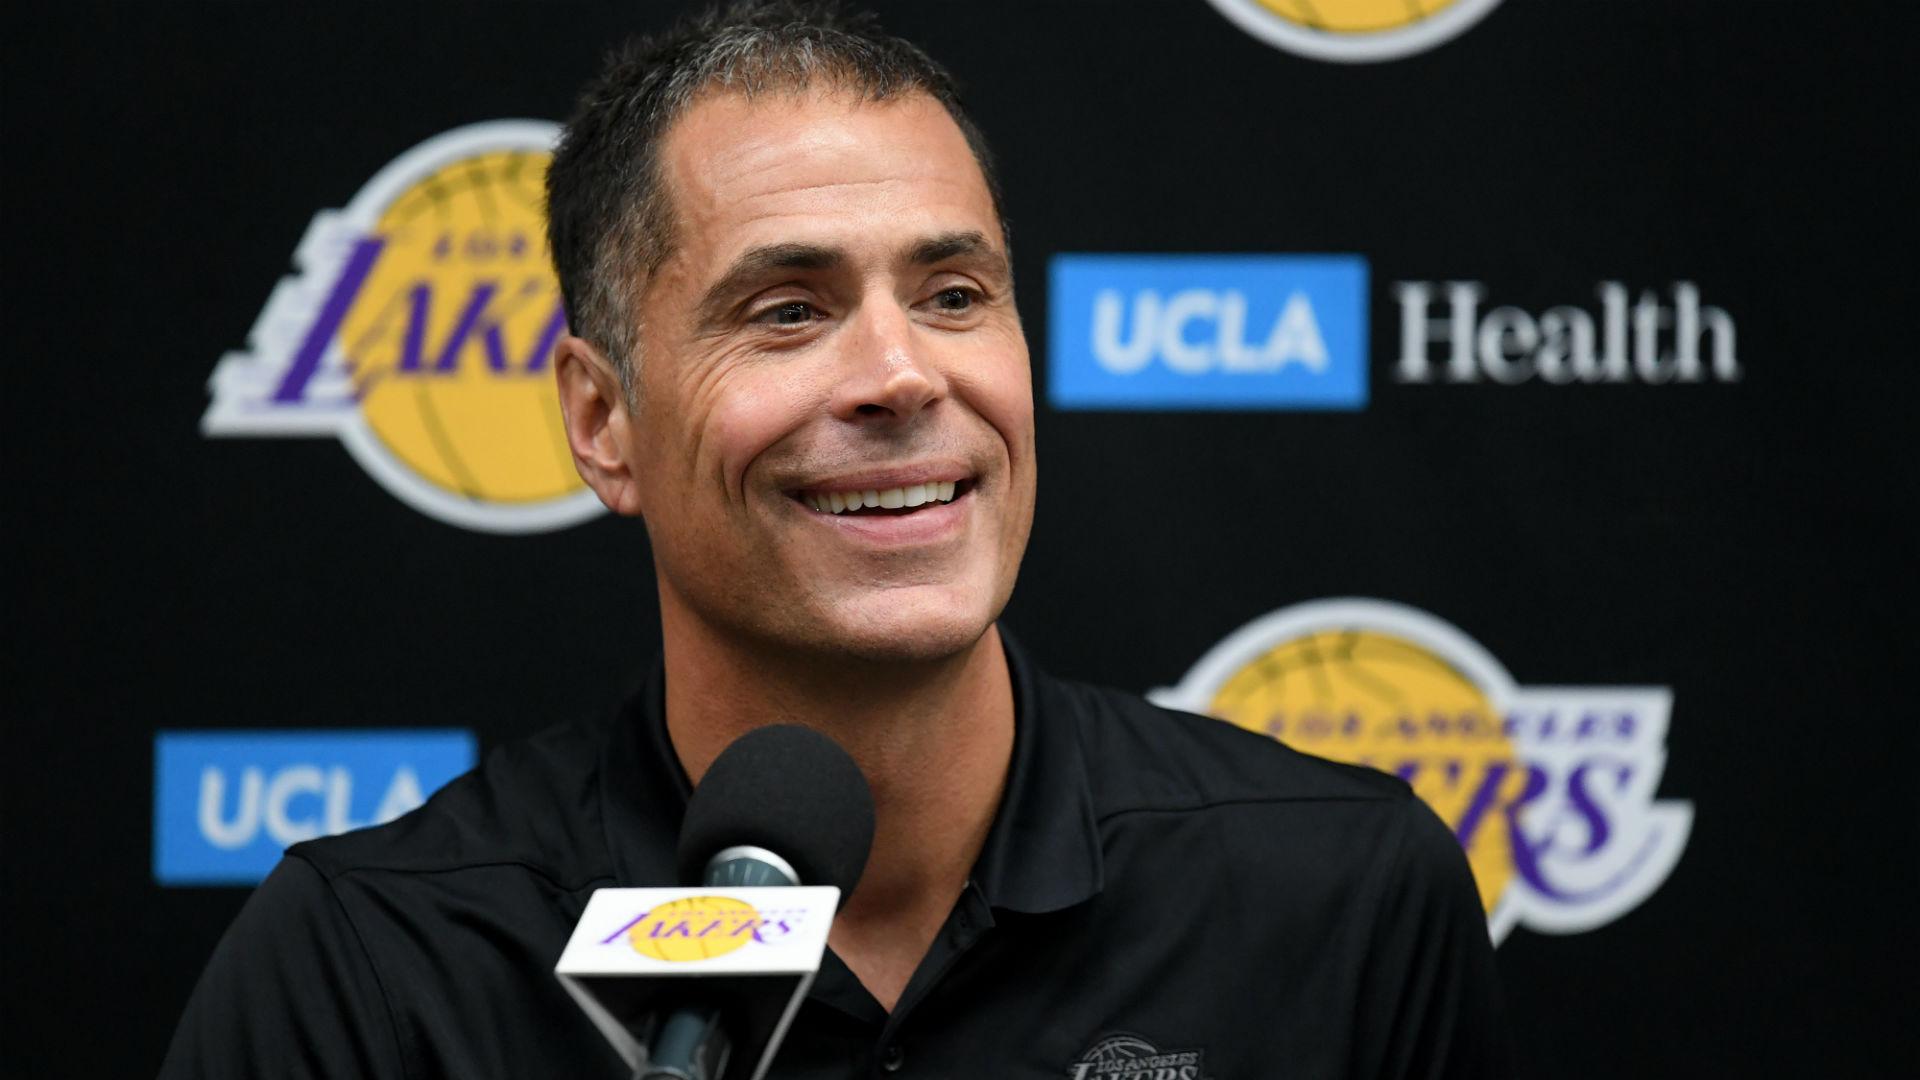 Lakers GM Rob Pelinka: Team looking to retool, 'smartly build' championship-caliber roster